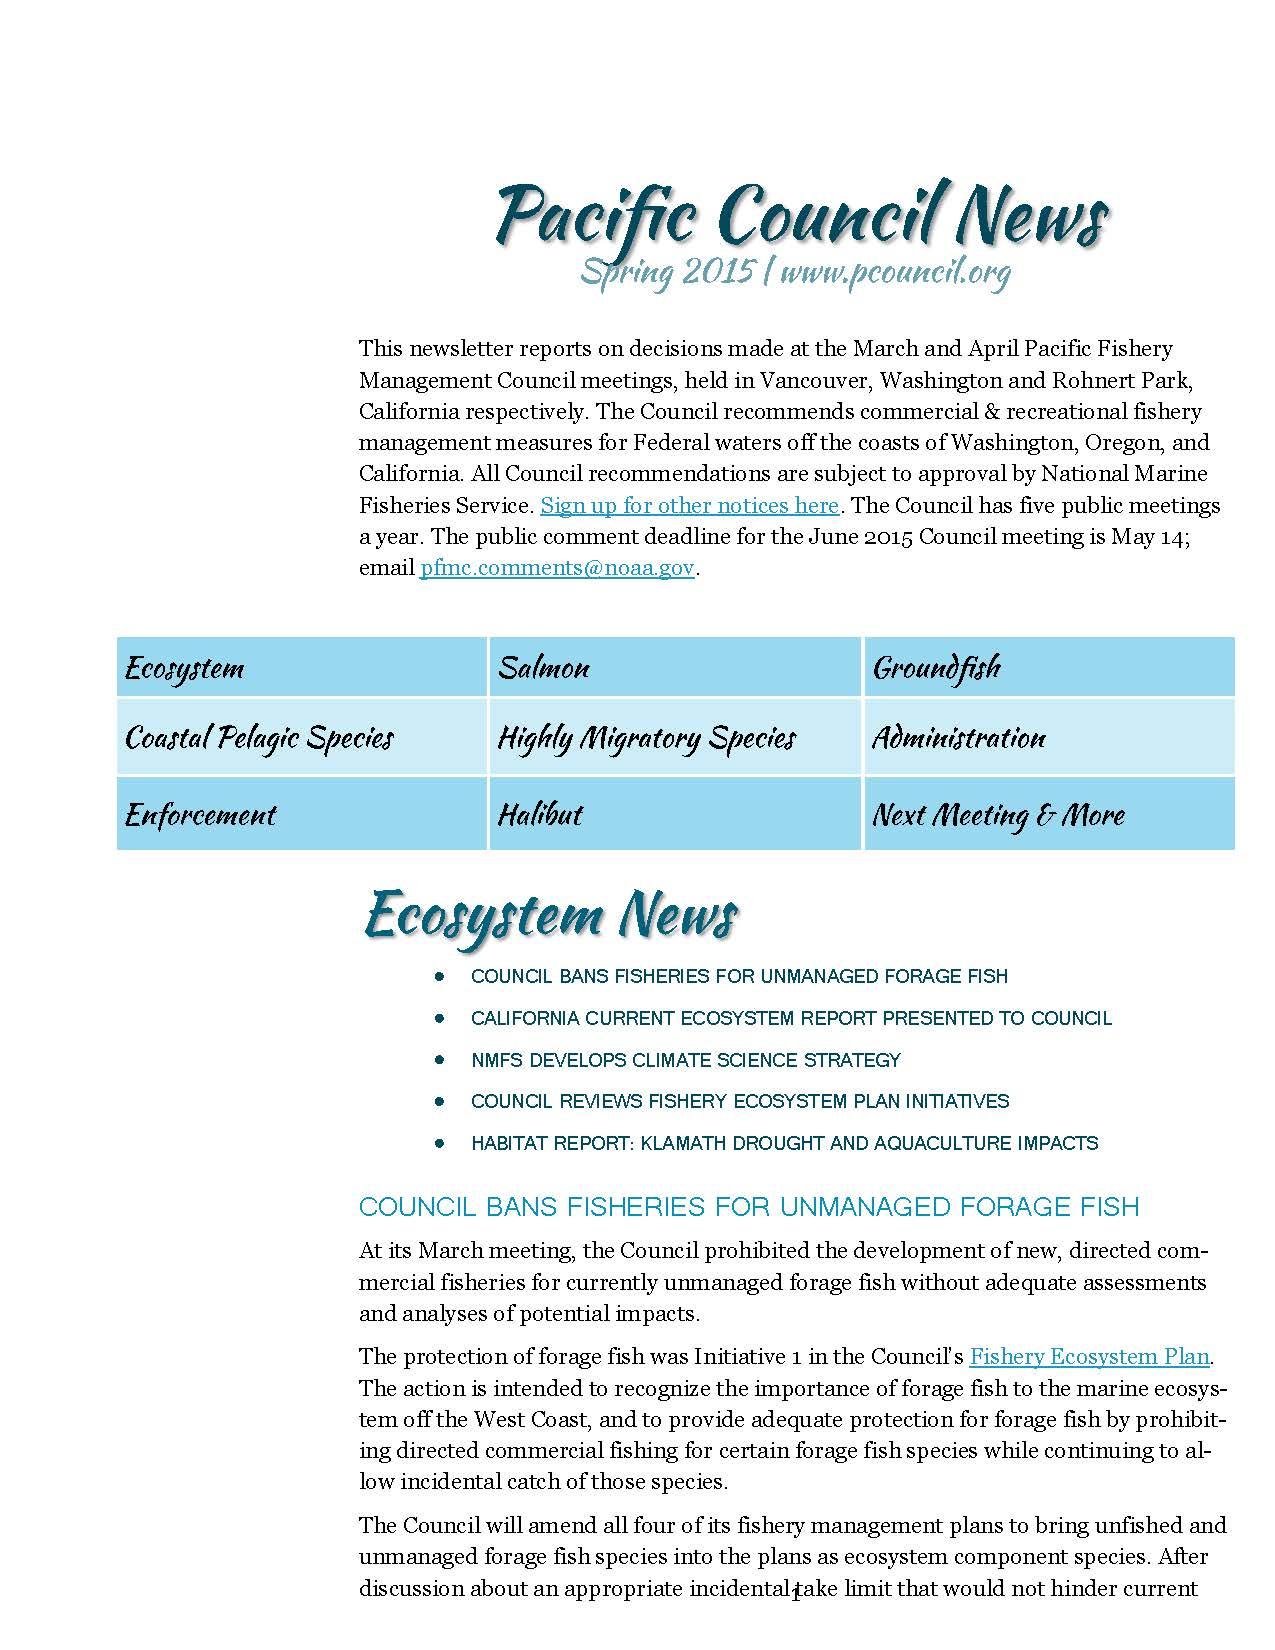 Spring 2015 newsletter image